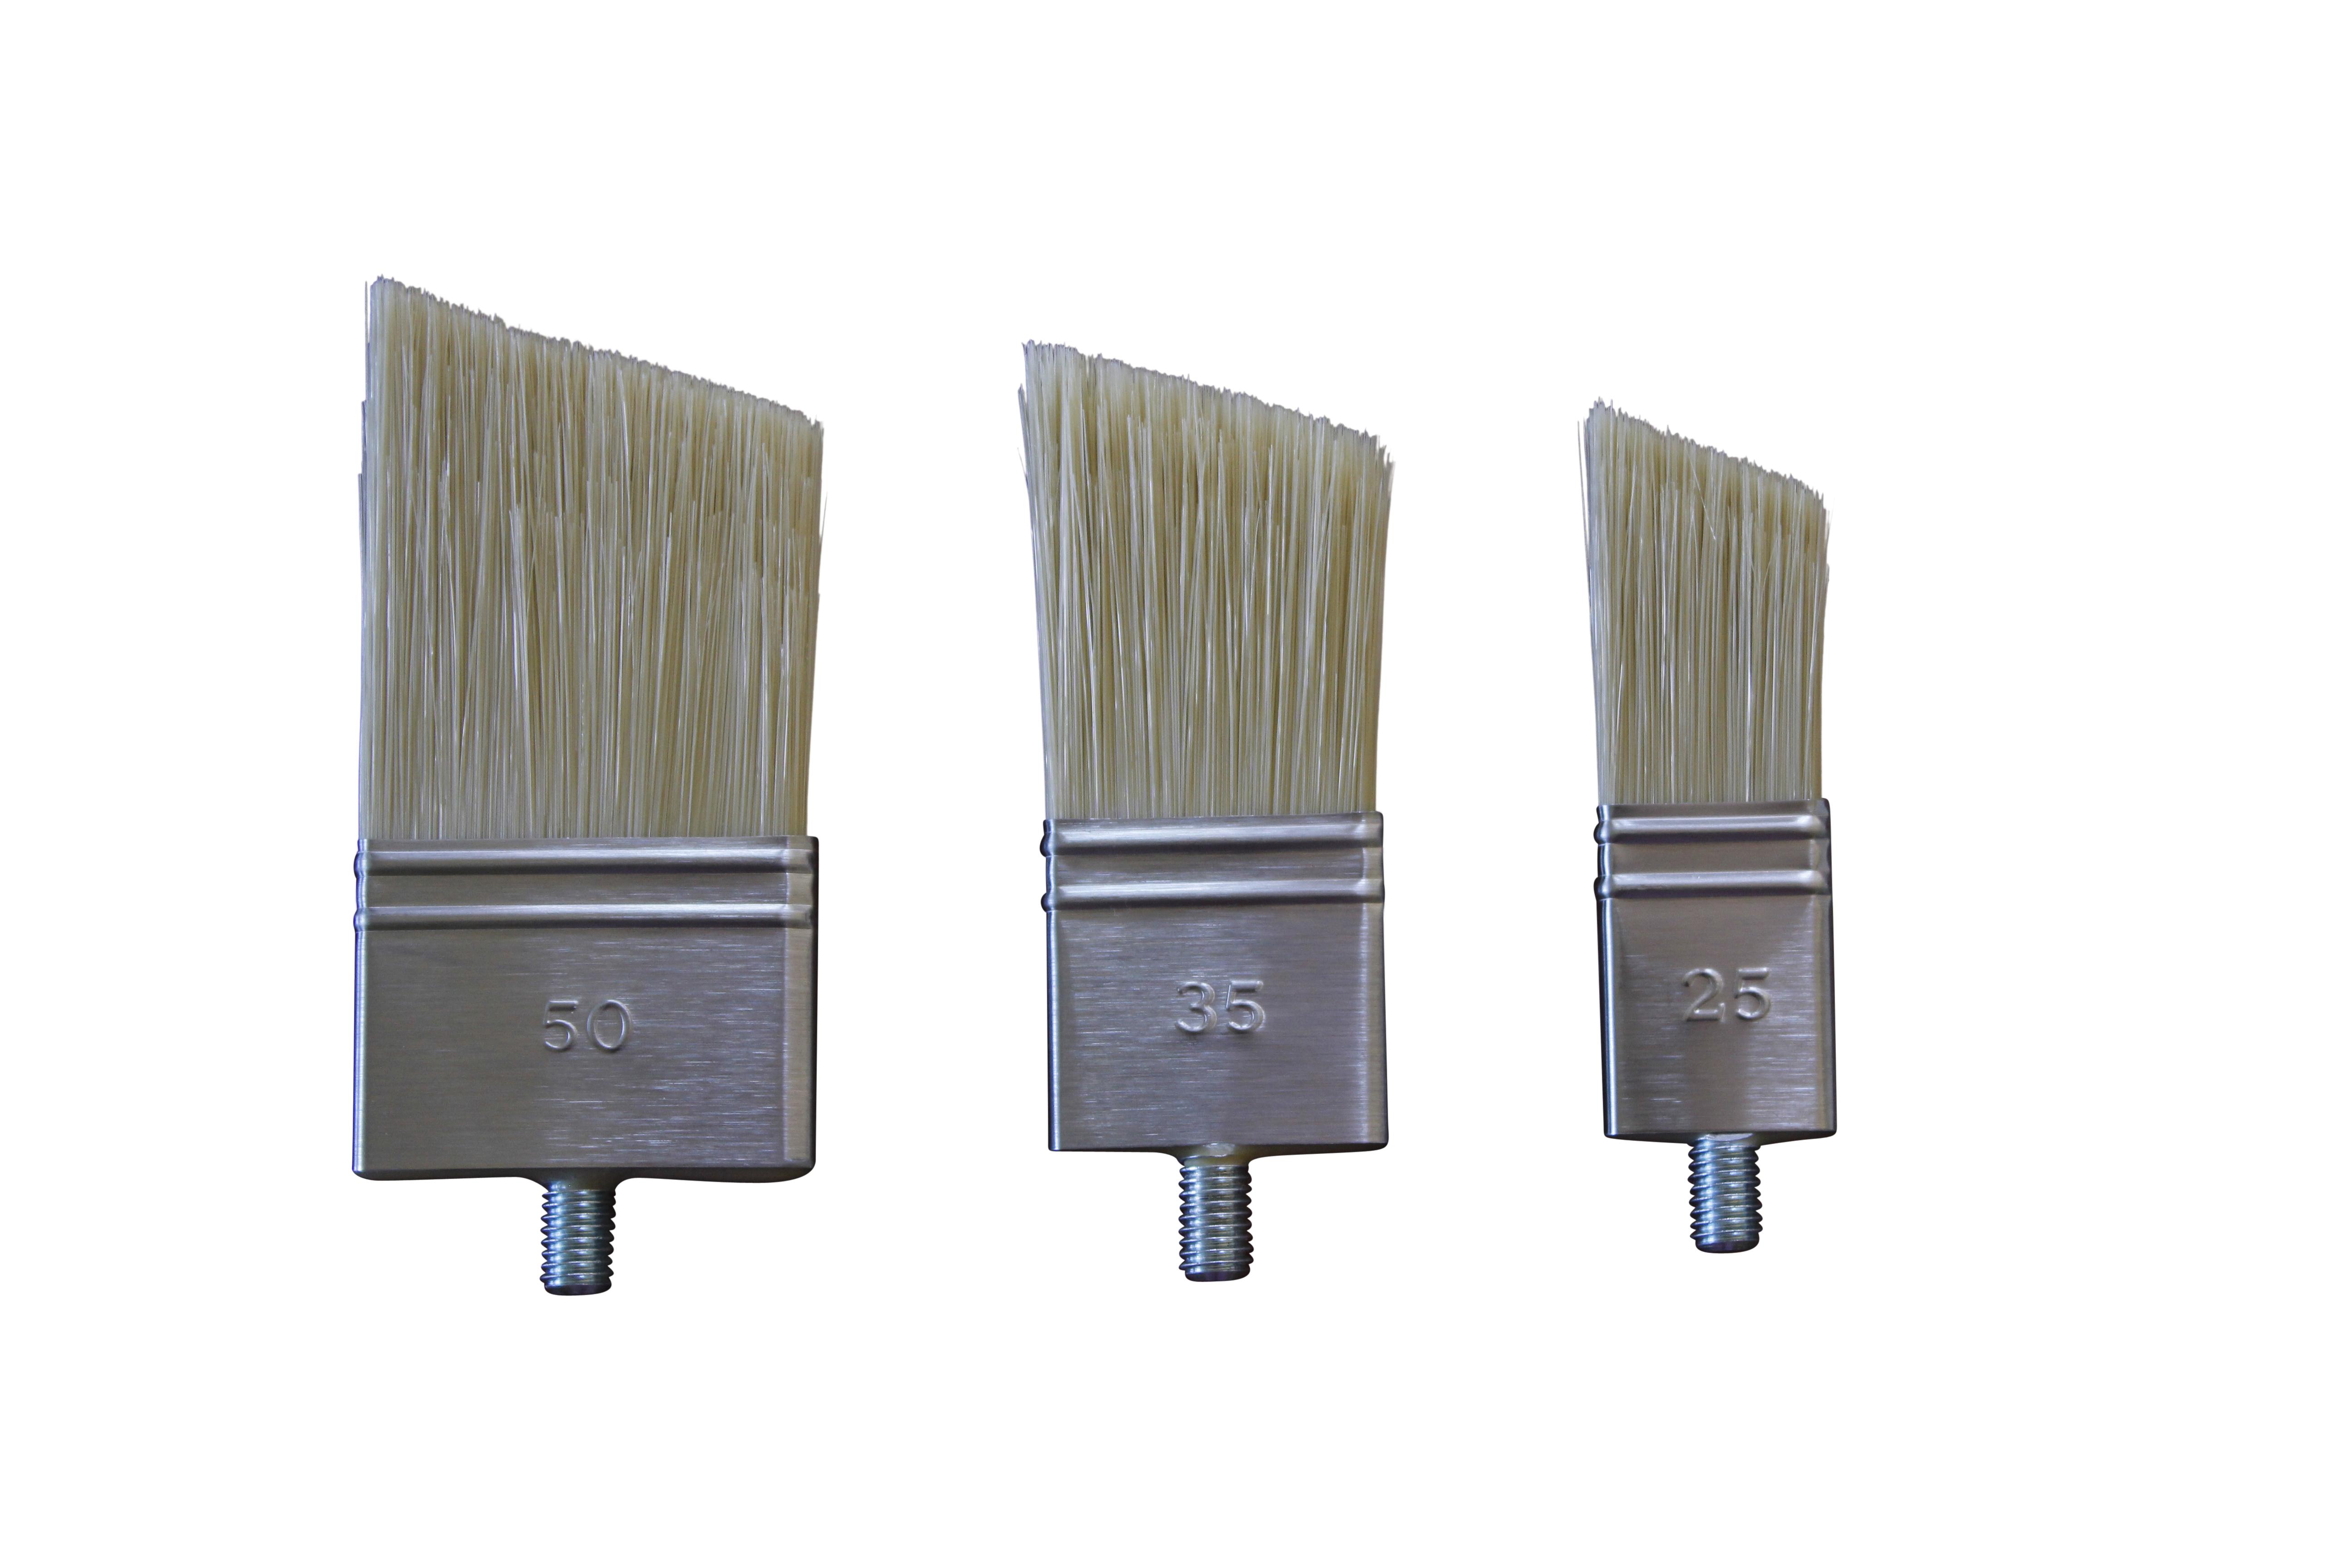 295  Tintenpinsel, extra dünn, schräg, synthetic